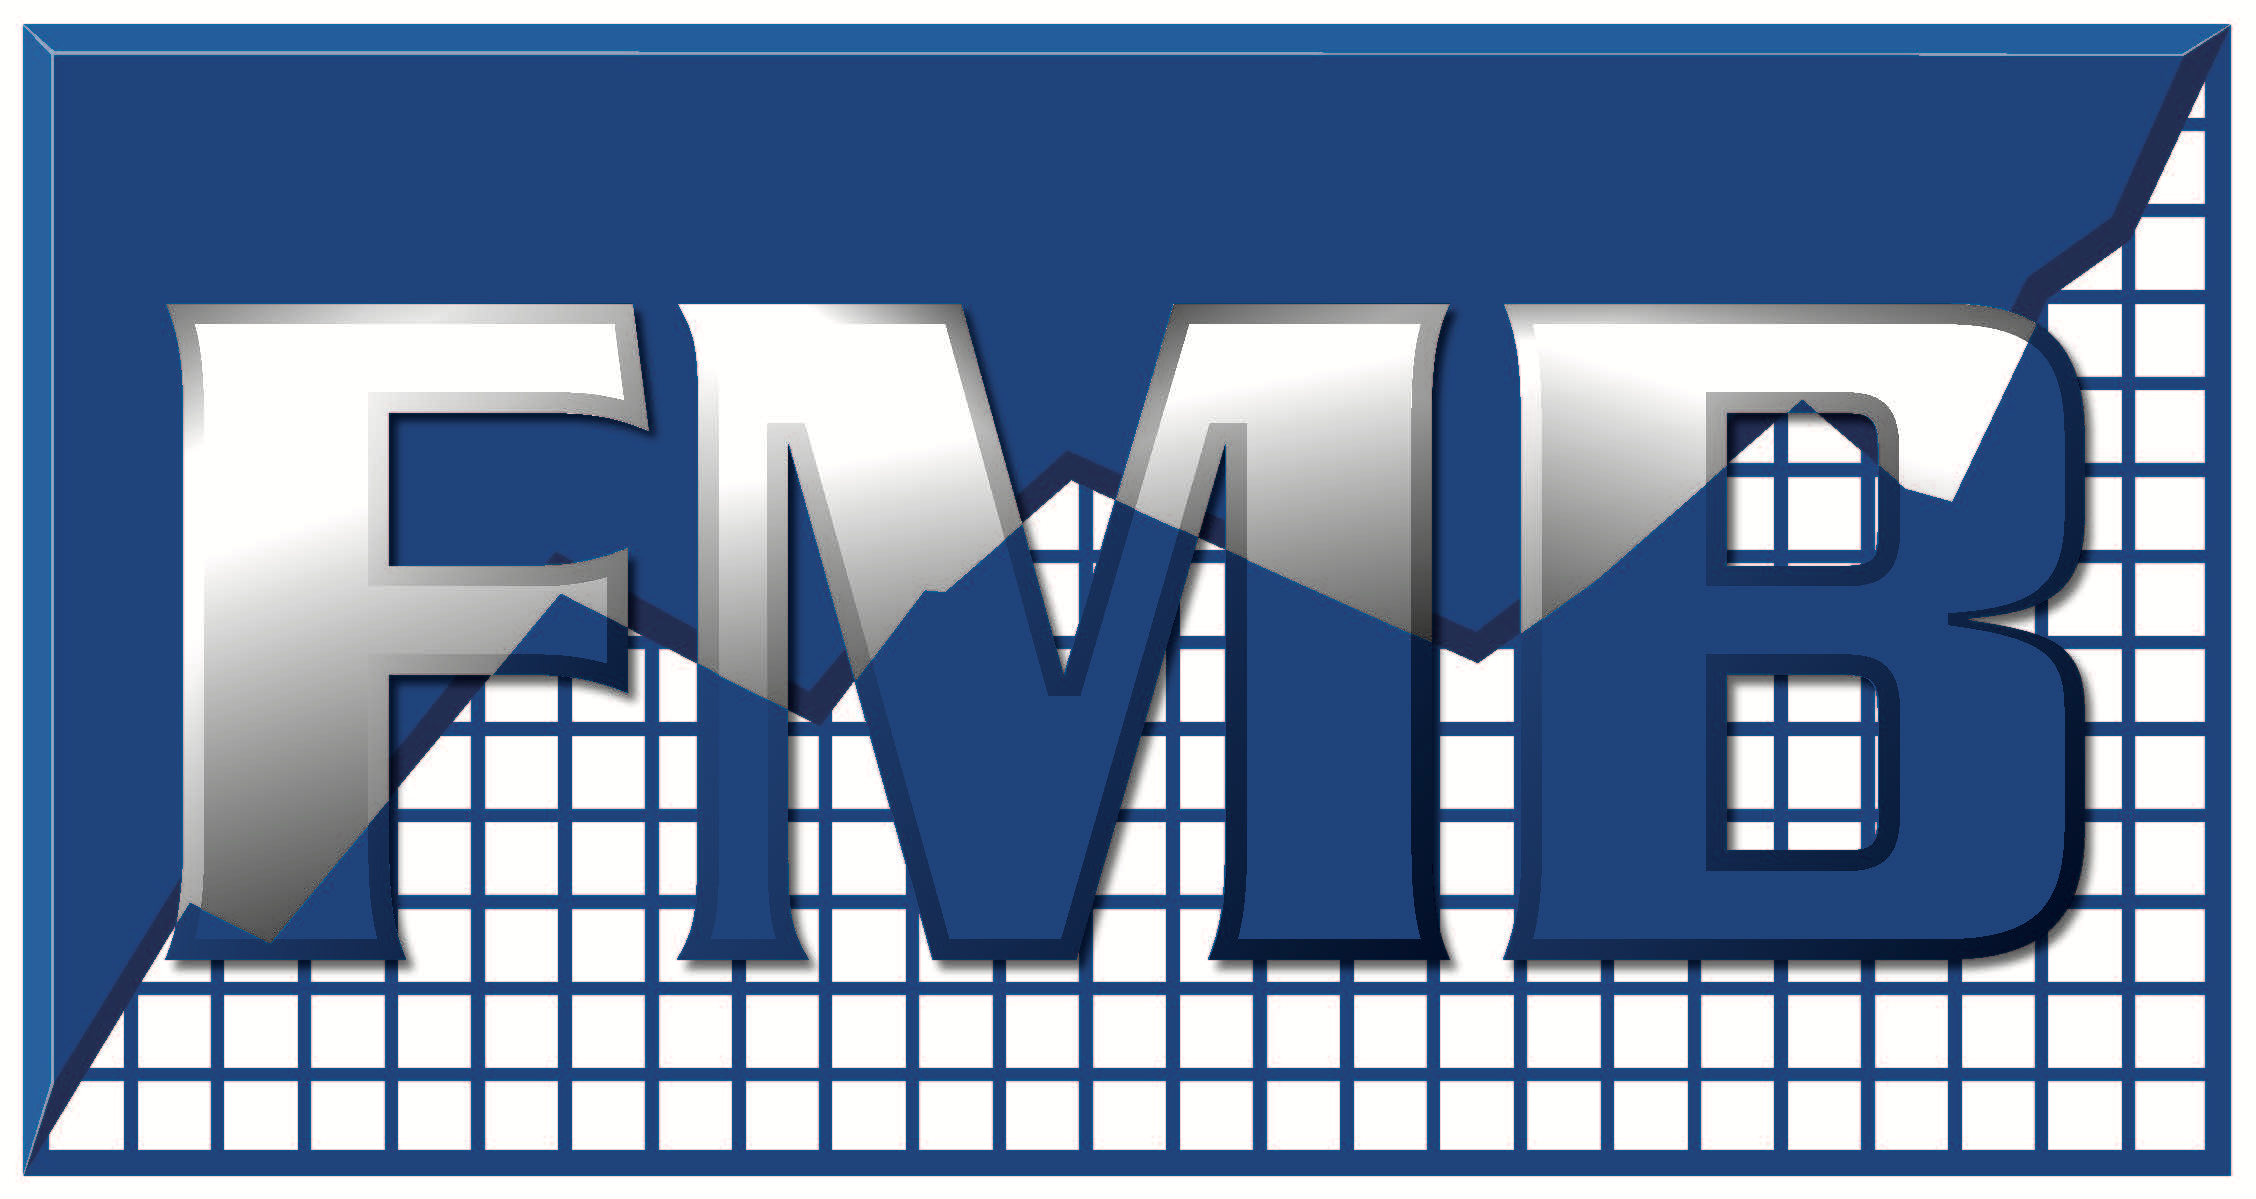 Logo for FMB Wealth Management